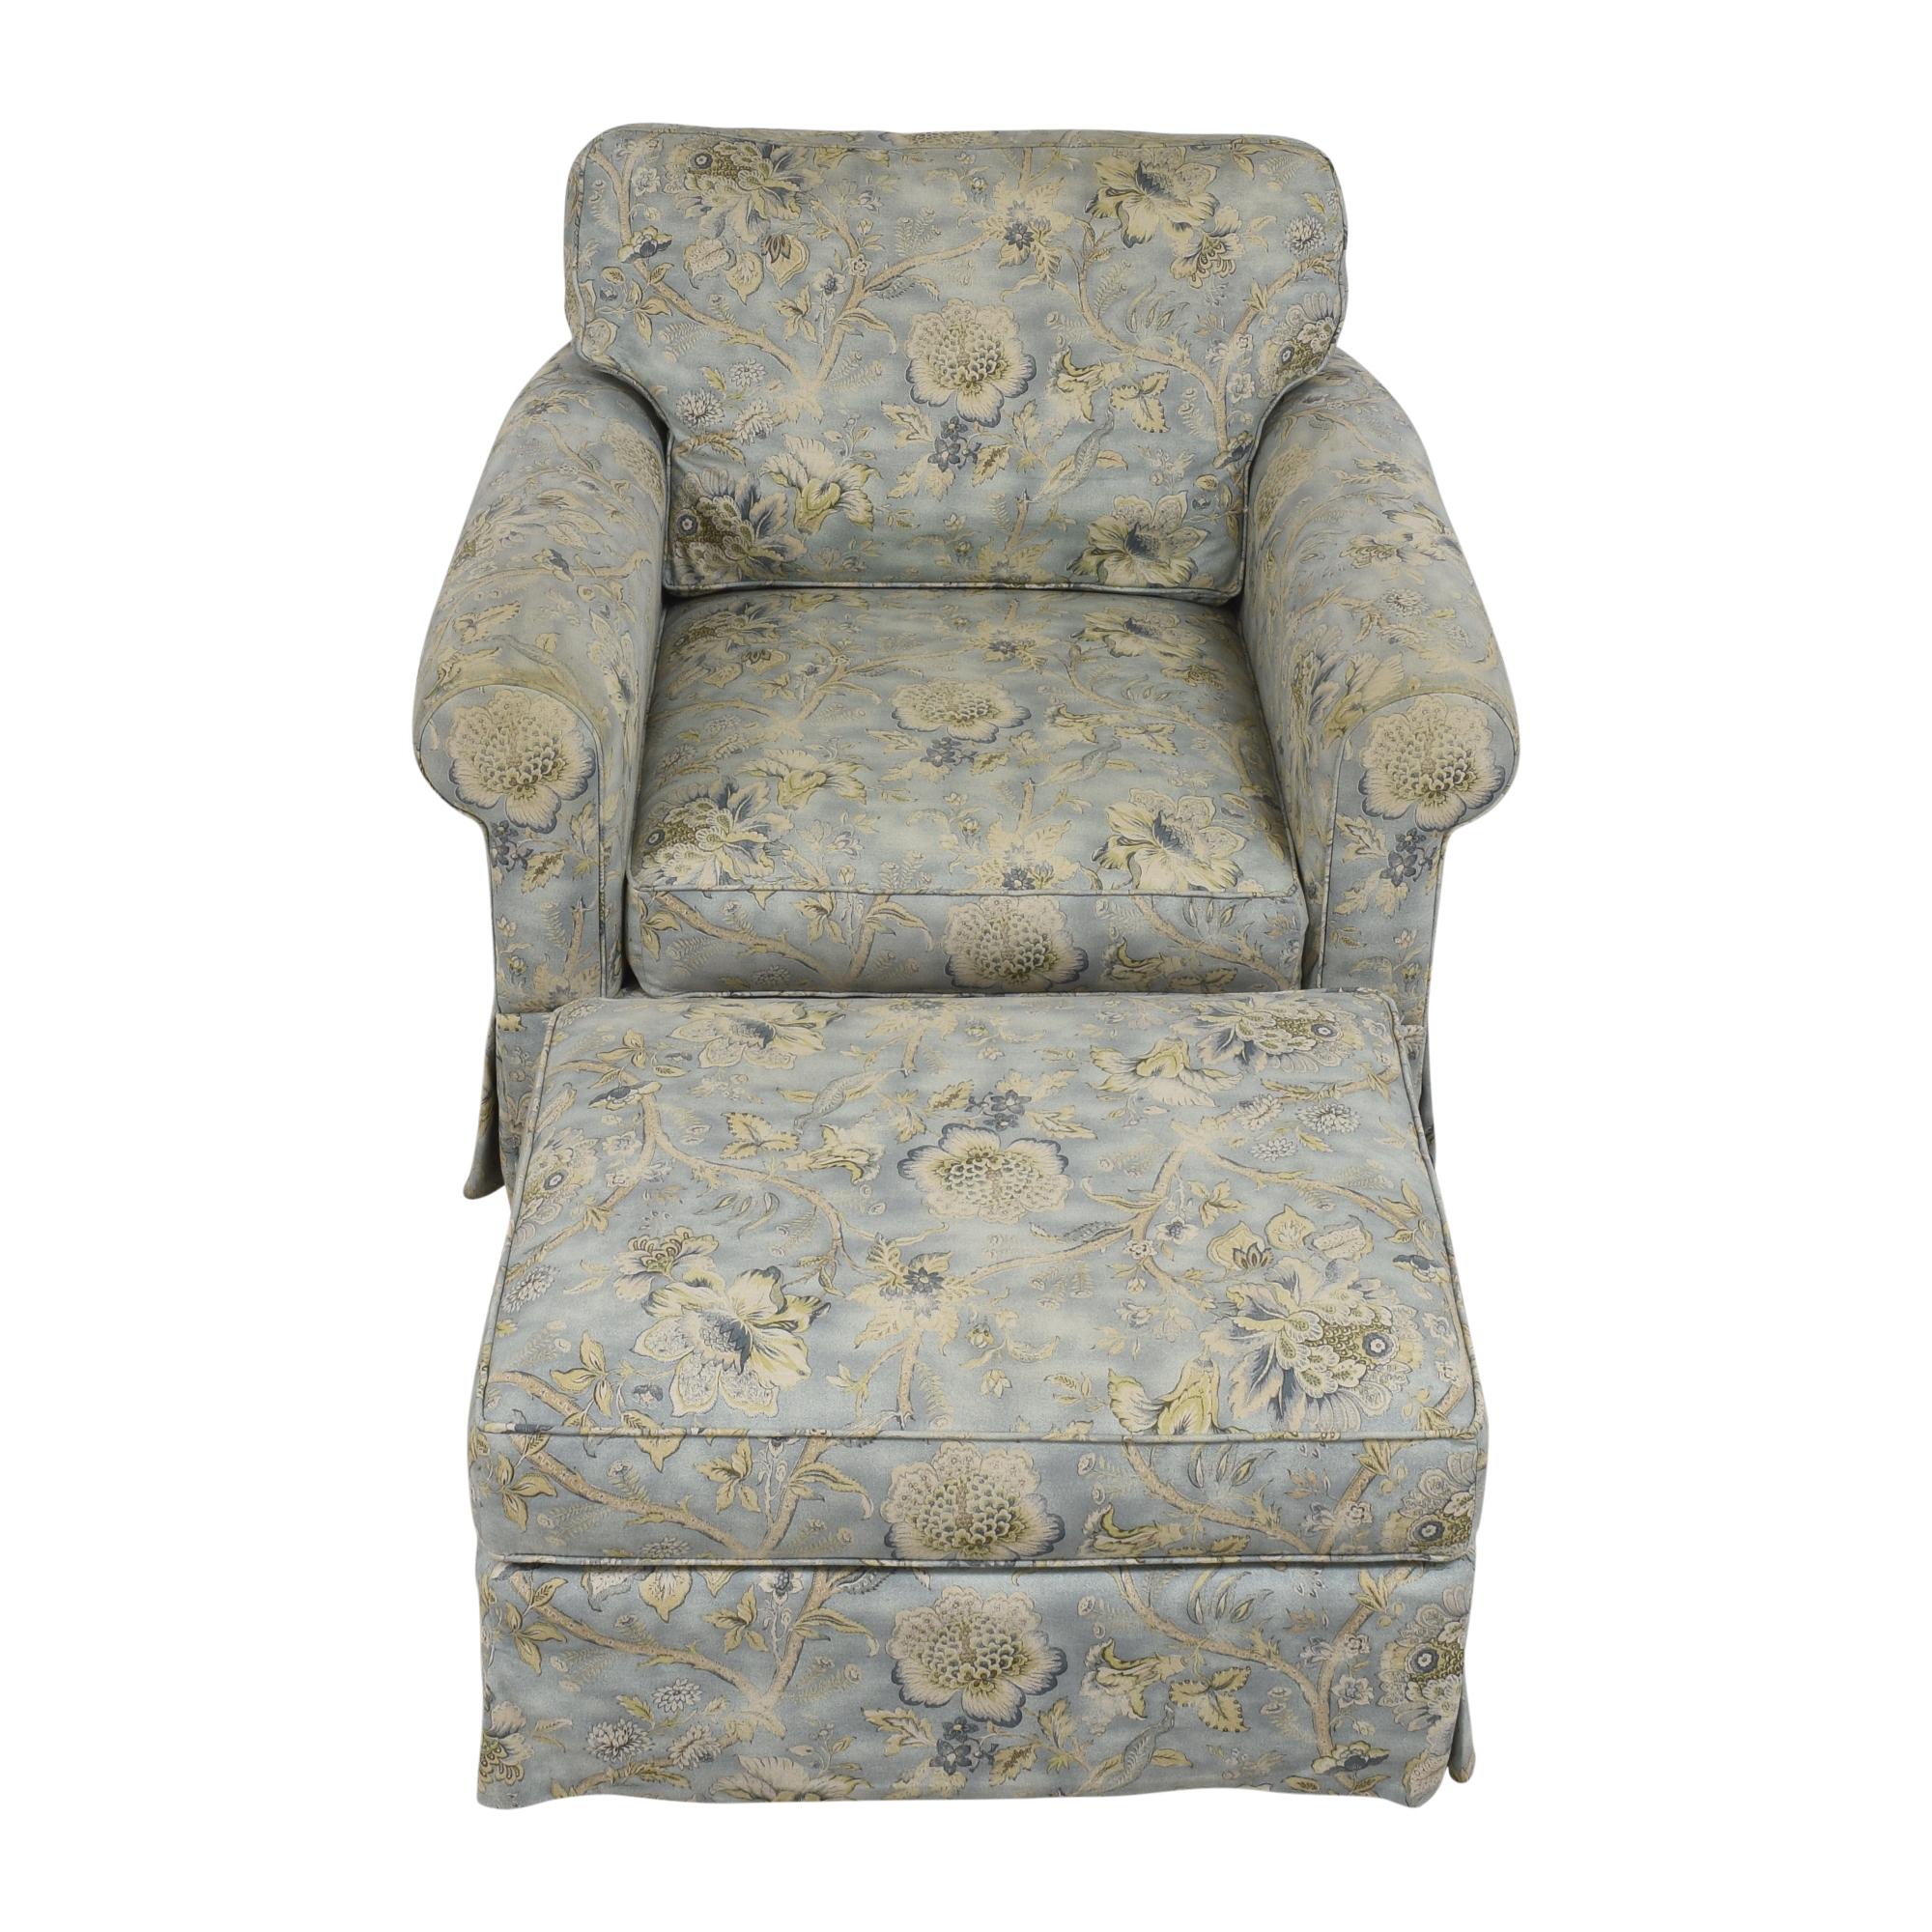 Arhaus Arhaus Baldwin Upholstered Swivel Chair with Ottoman for sale